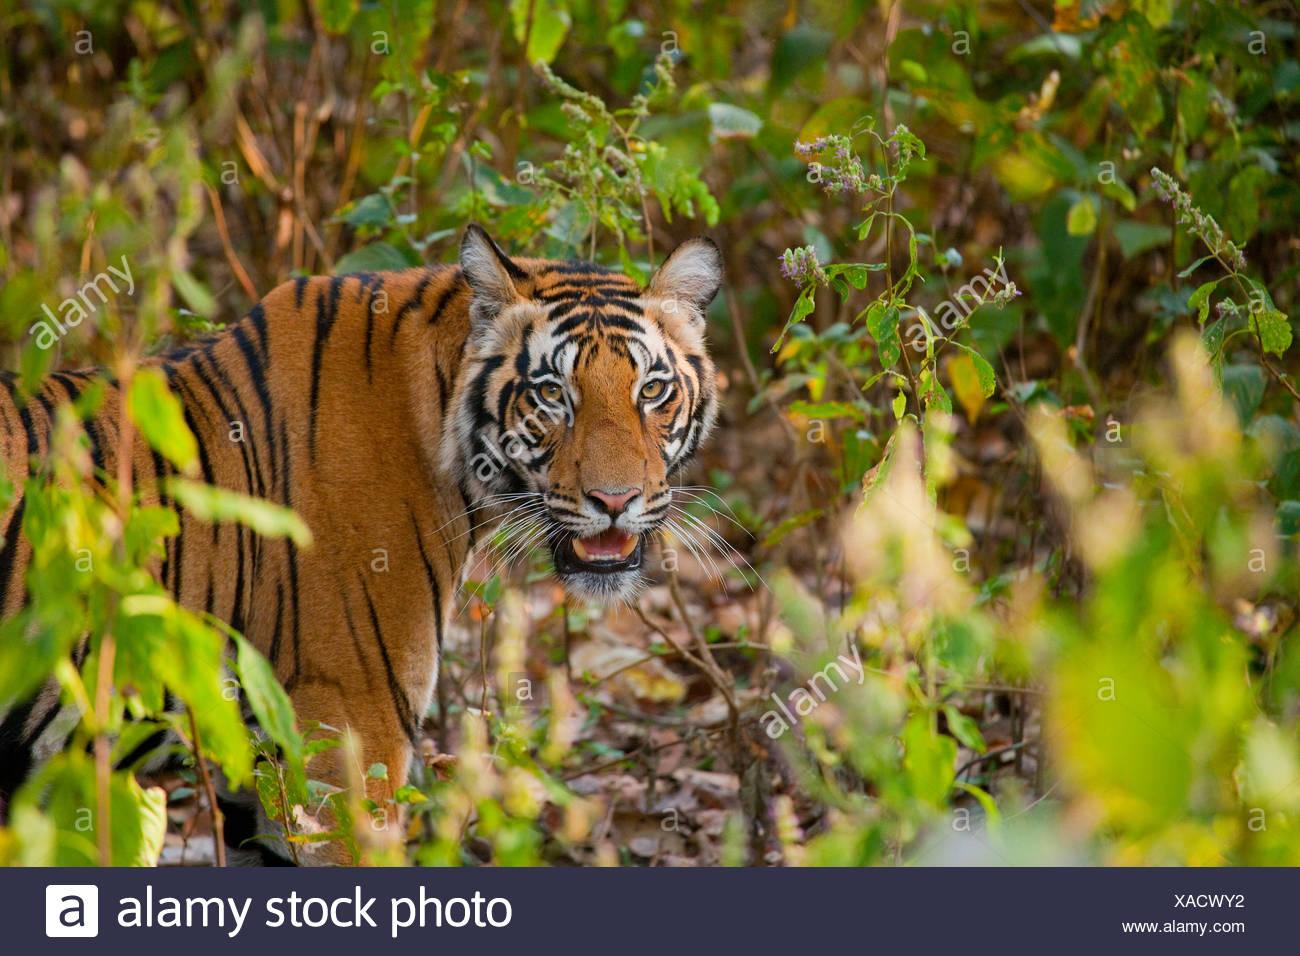 Bengal Tiger, Bandhavgarh National Park, Madhya Pradesh, India - Stock Image